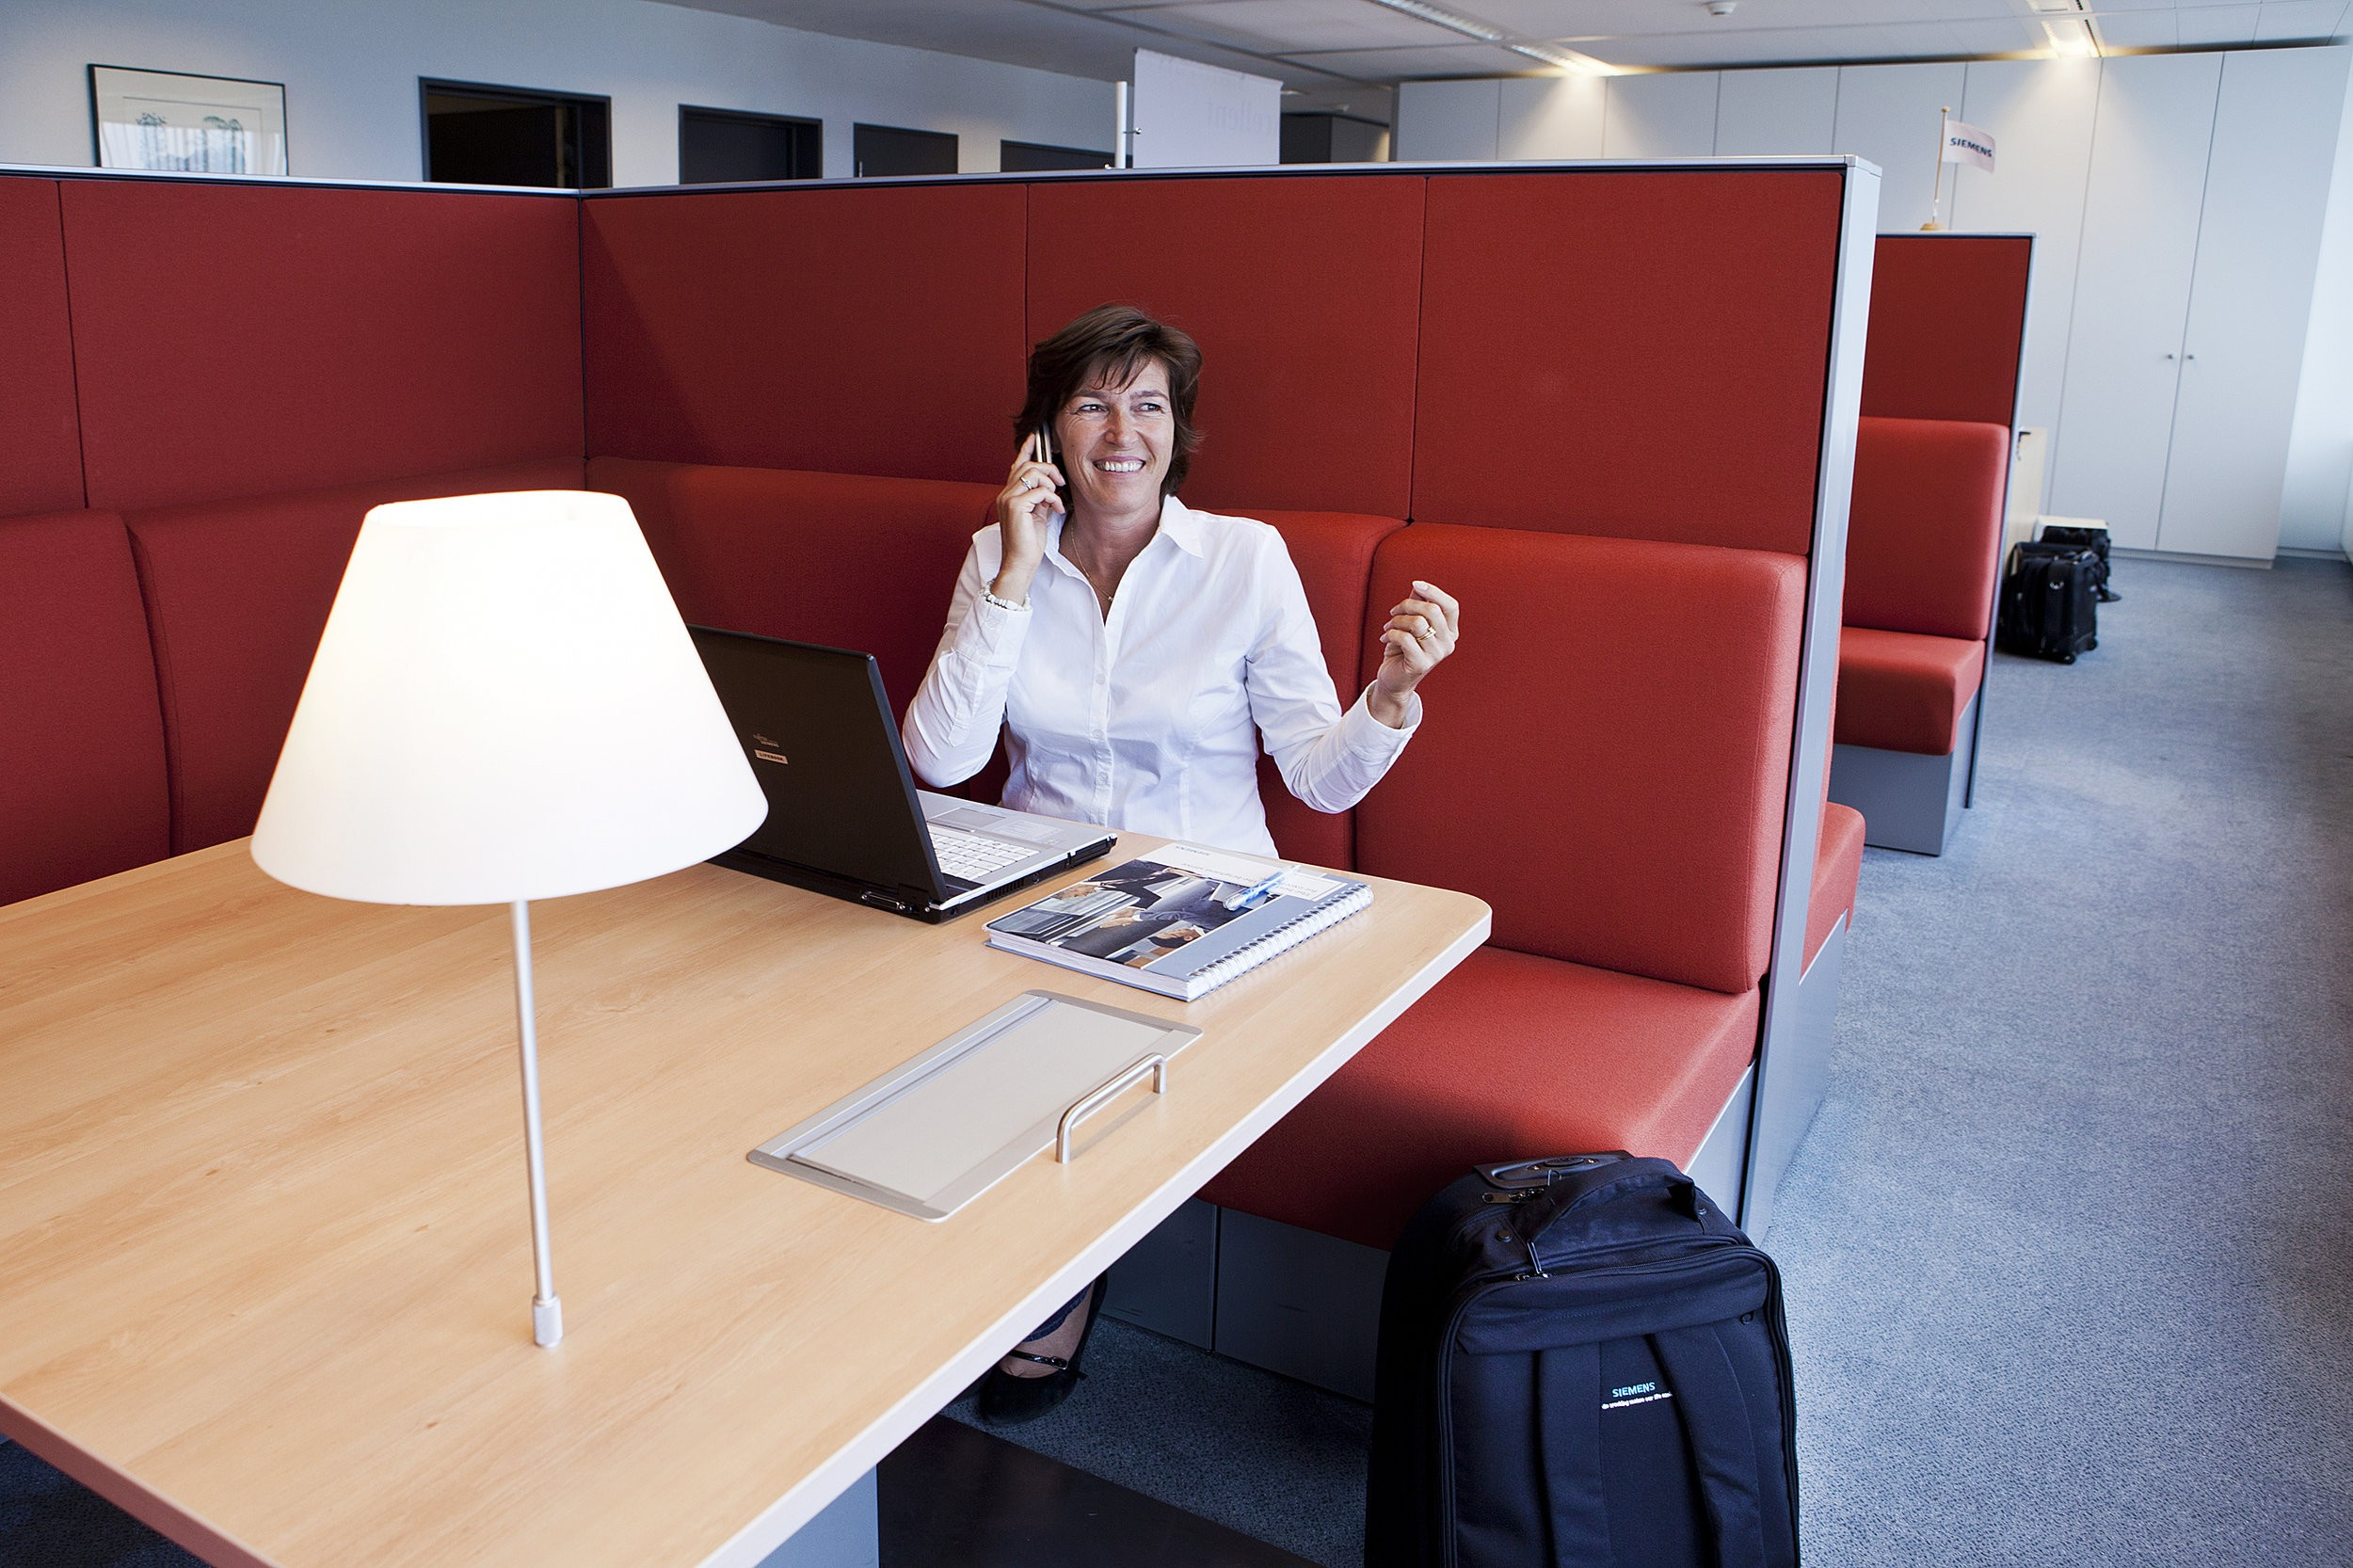 johanna-lohr-siemens-corporate_fotografie_011